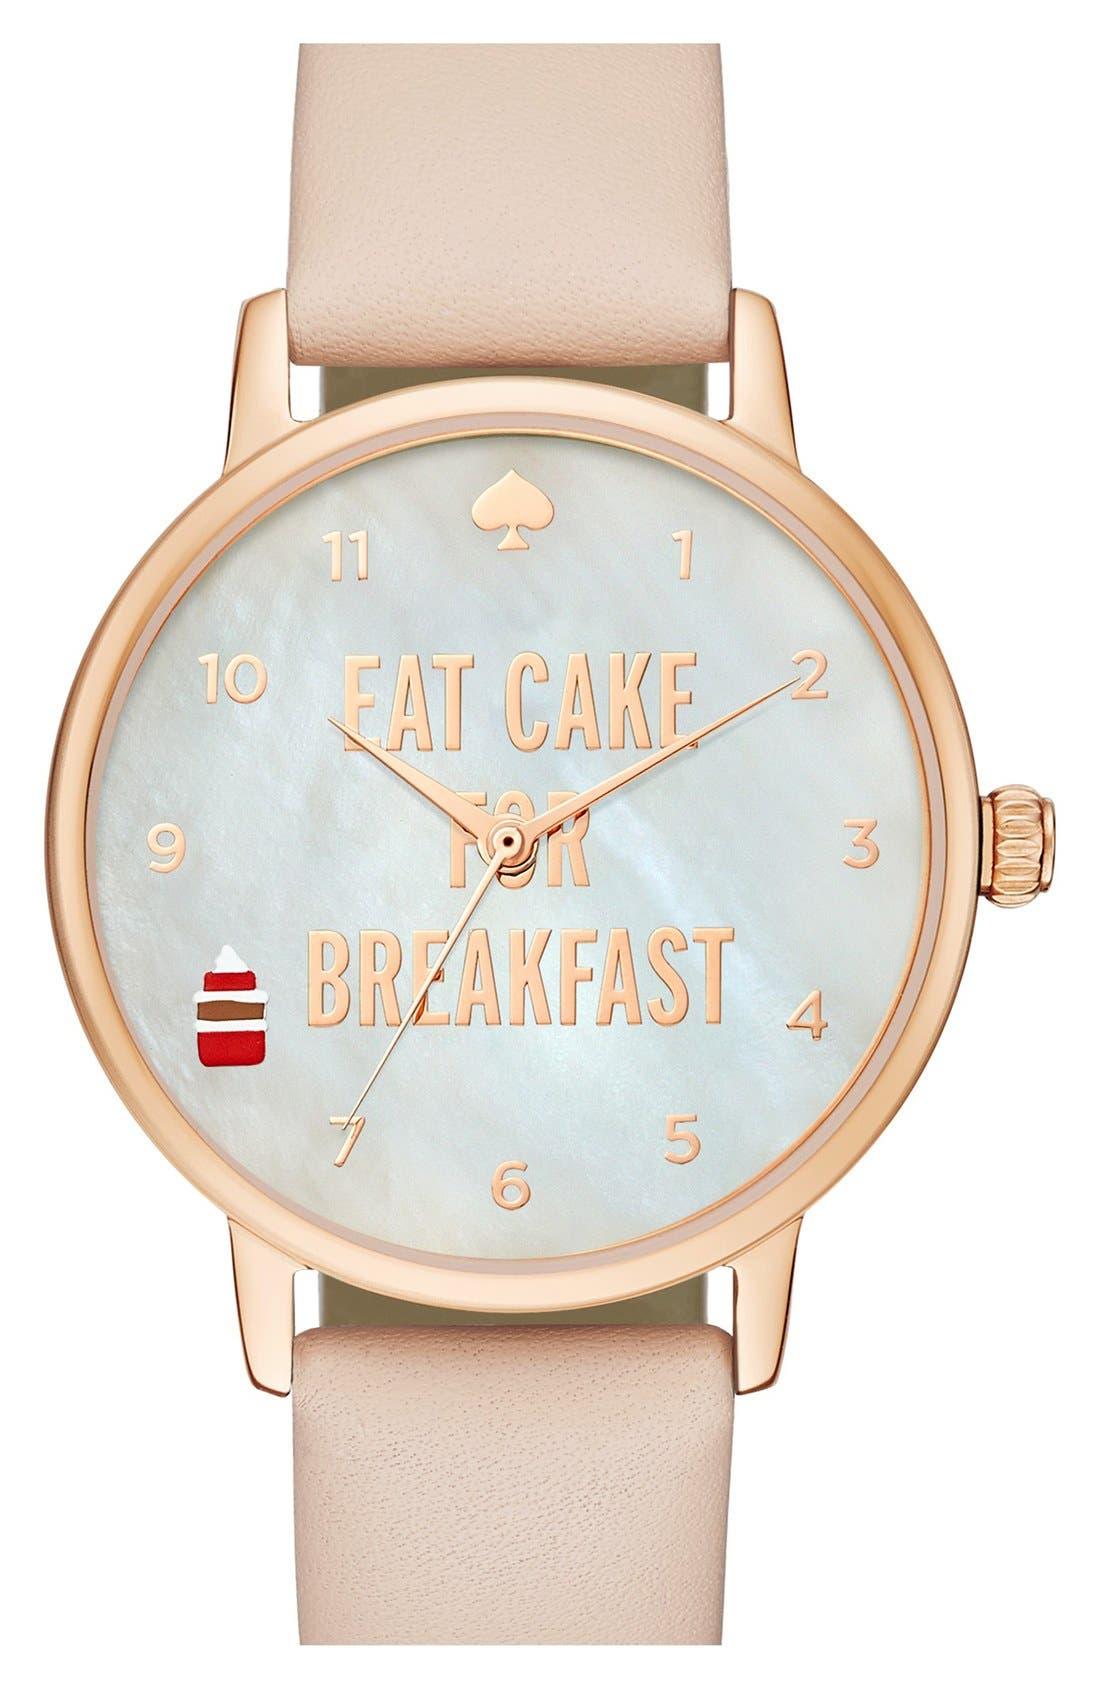 Alternate Image 1 Selected - kate spade new york 'metro - eat cake' leather strap watch, 34mm